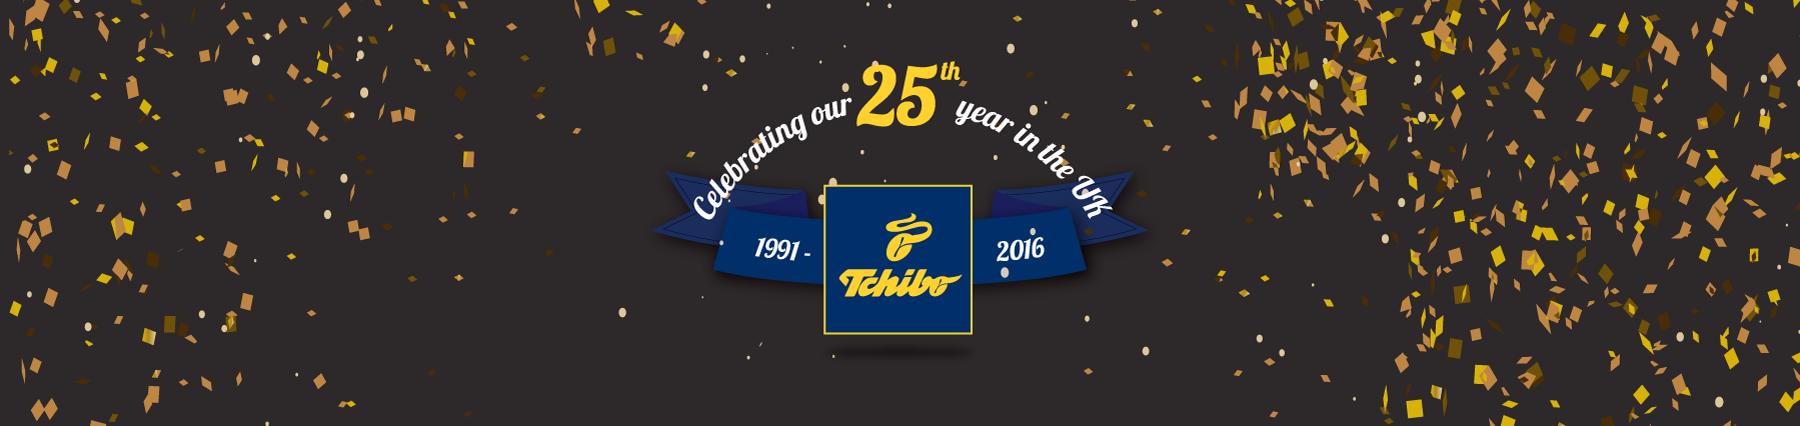 Tchibo History: 25 years